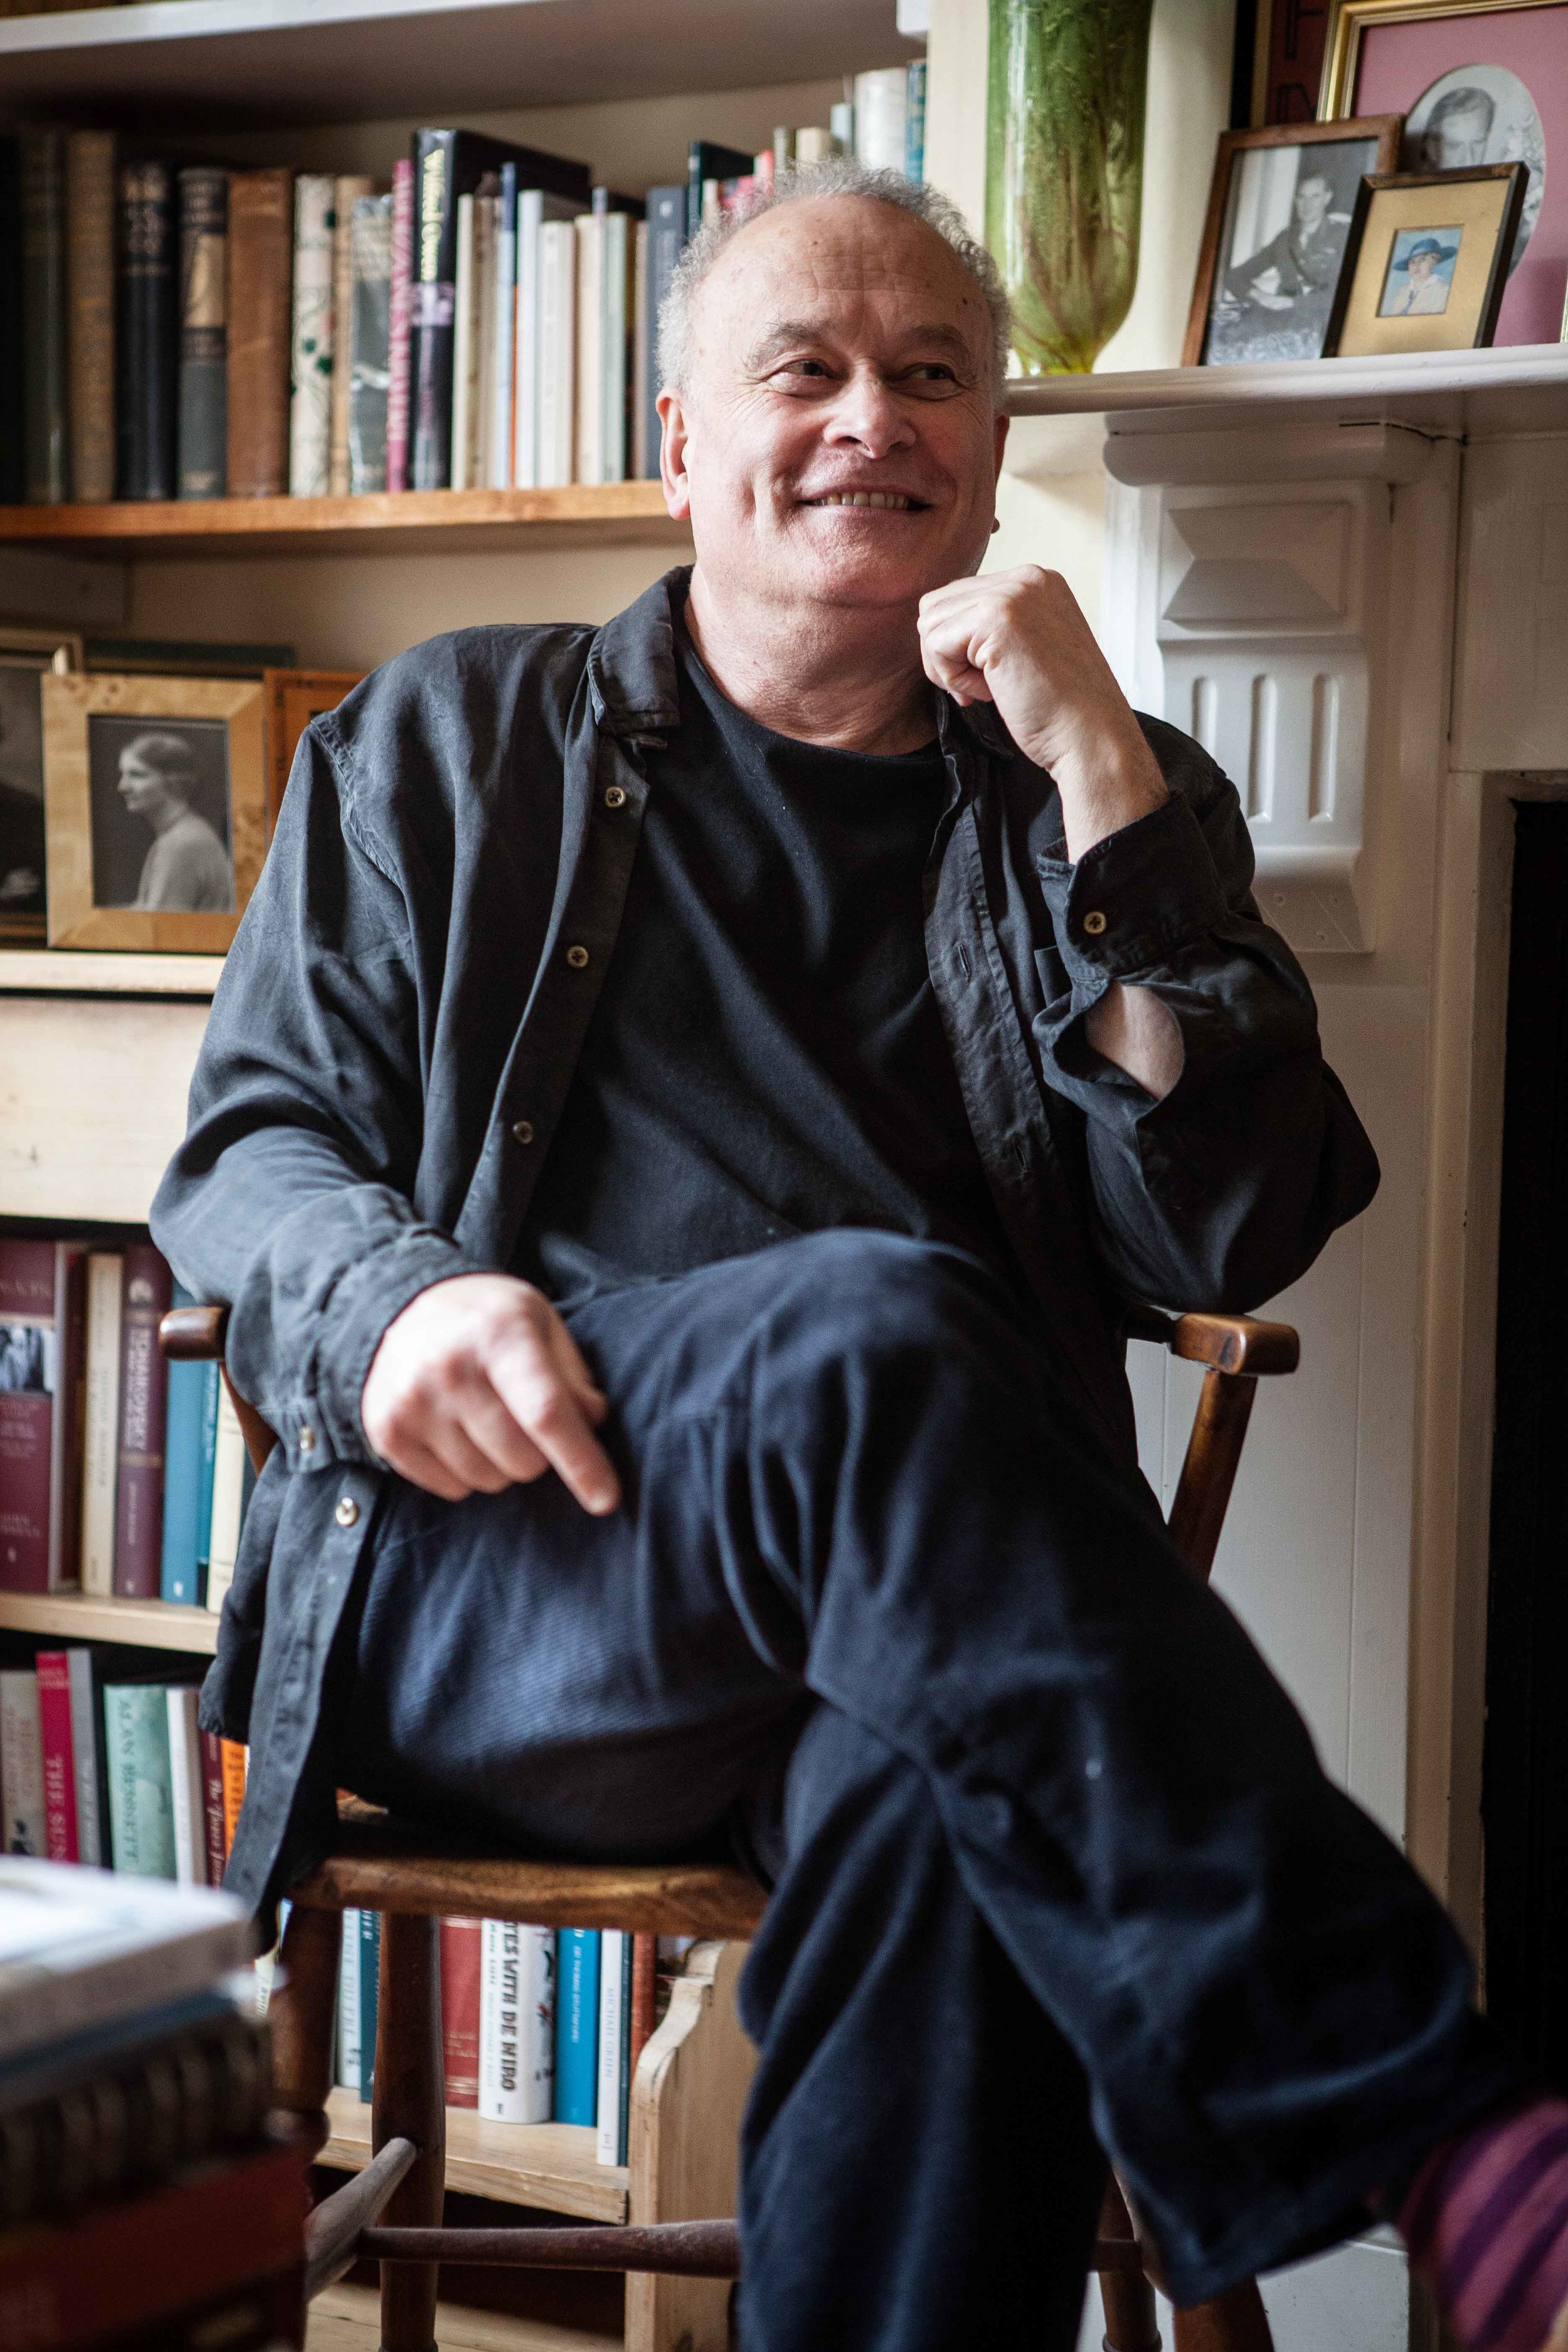 Colin Matthews OBE at home by Fiona Garden 2014